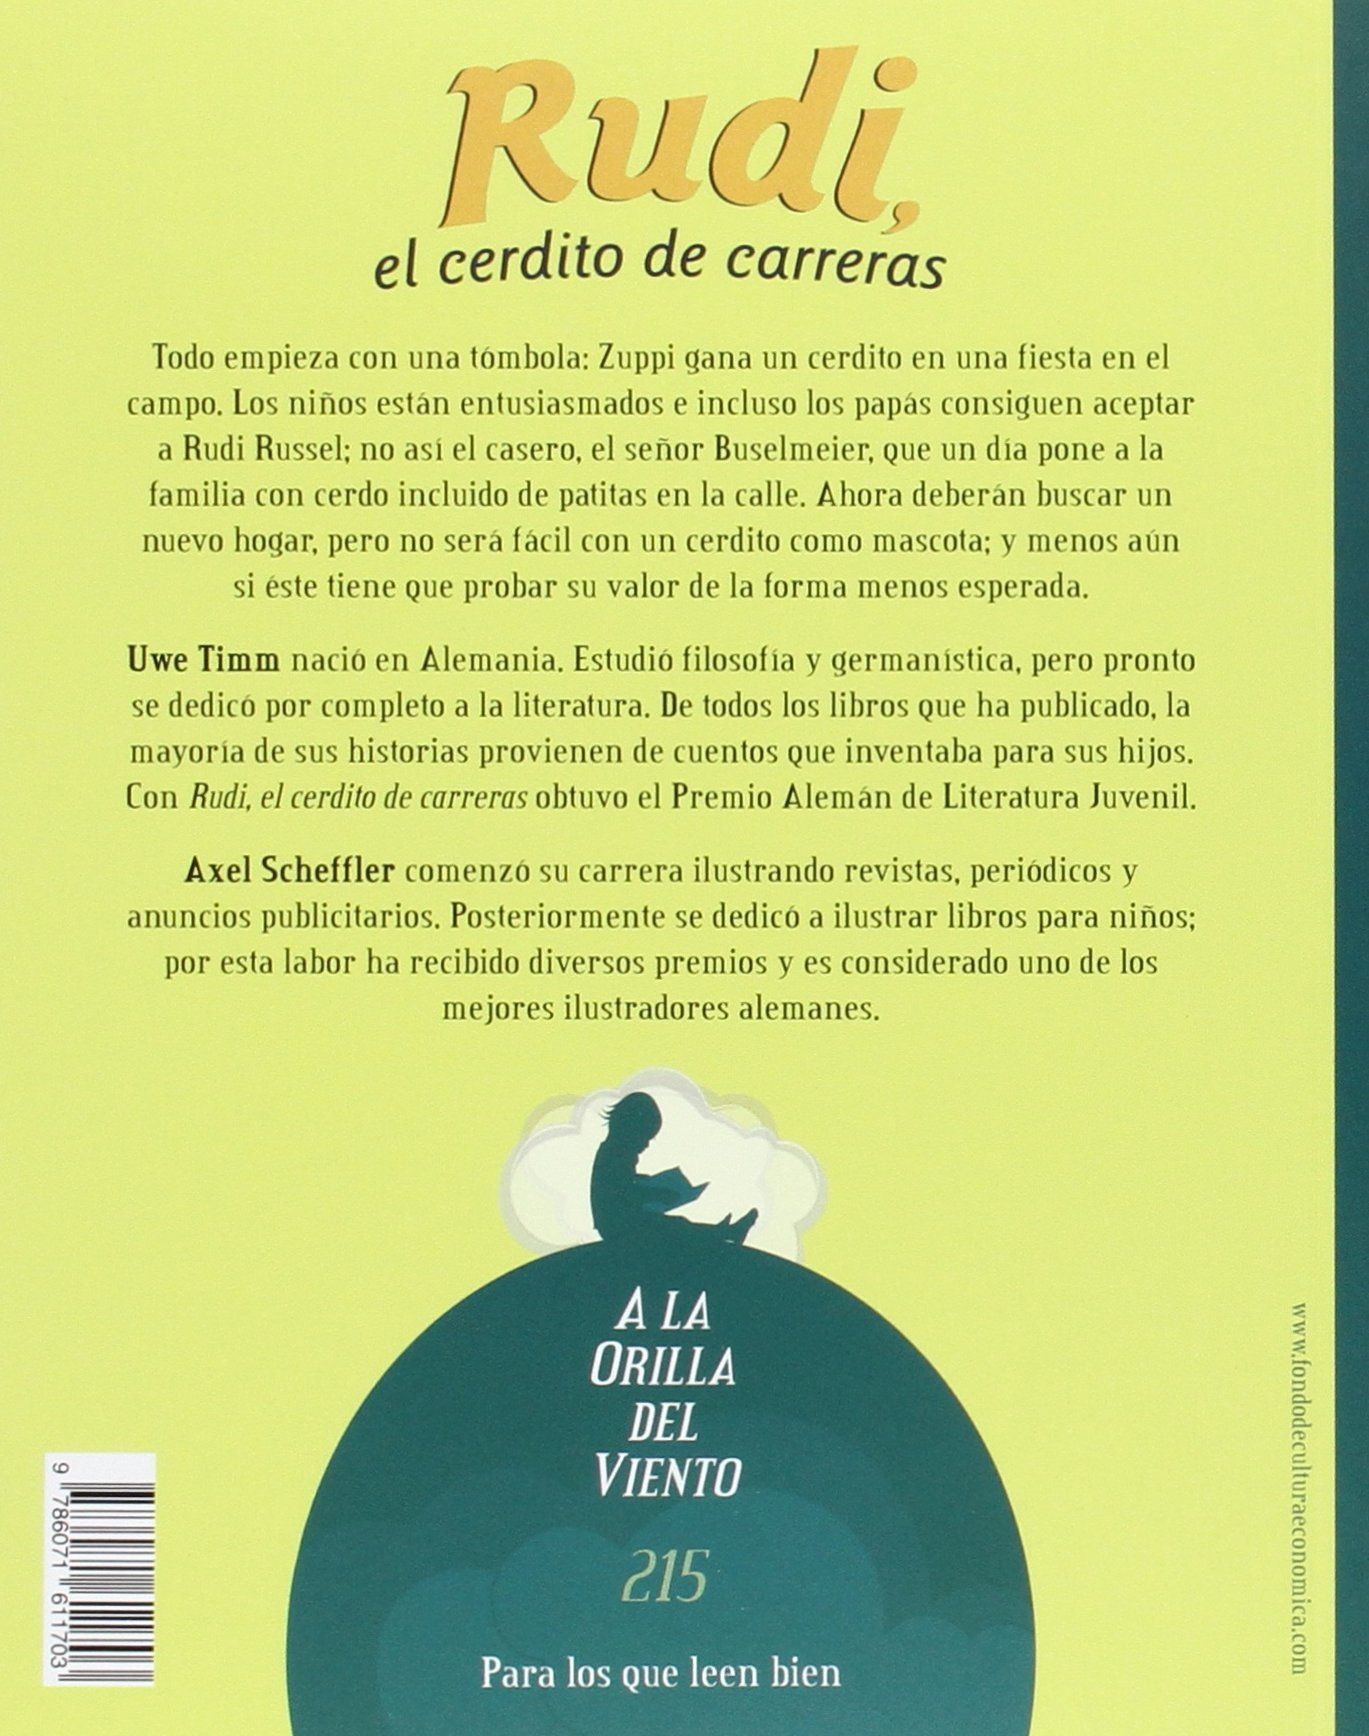 Rudi, el cerdito de carreras (A la Orilla del Viento) (Spanish Edition): Uwe Timm: 9786071611703: Amazon.com: Books